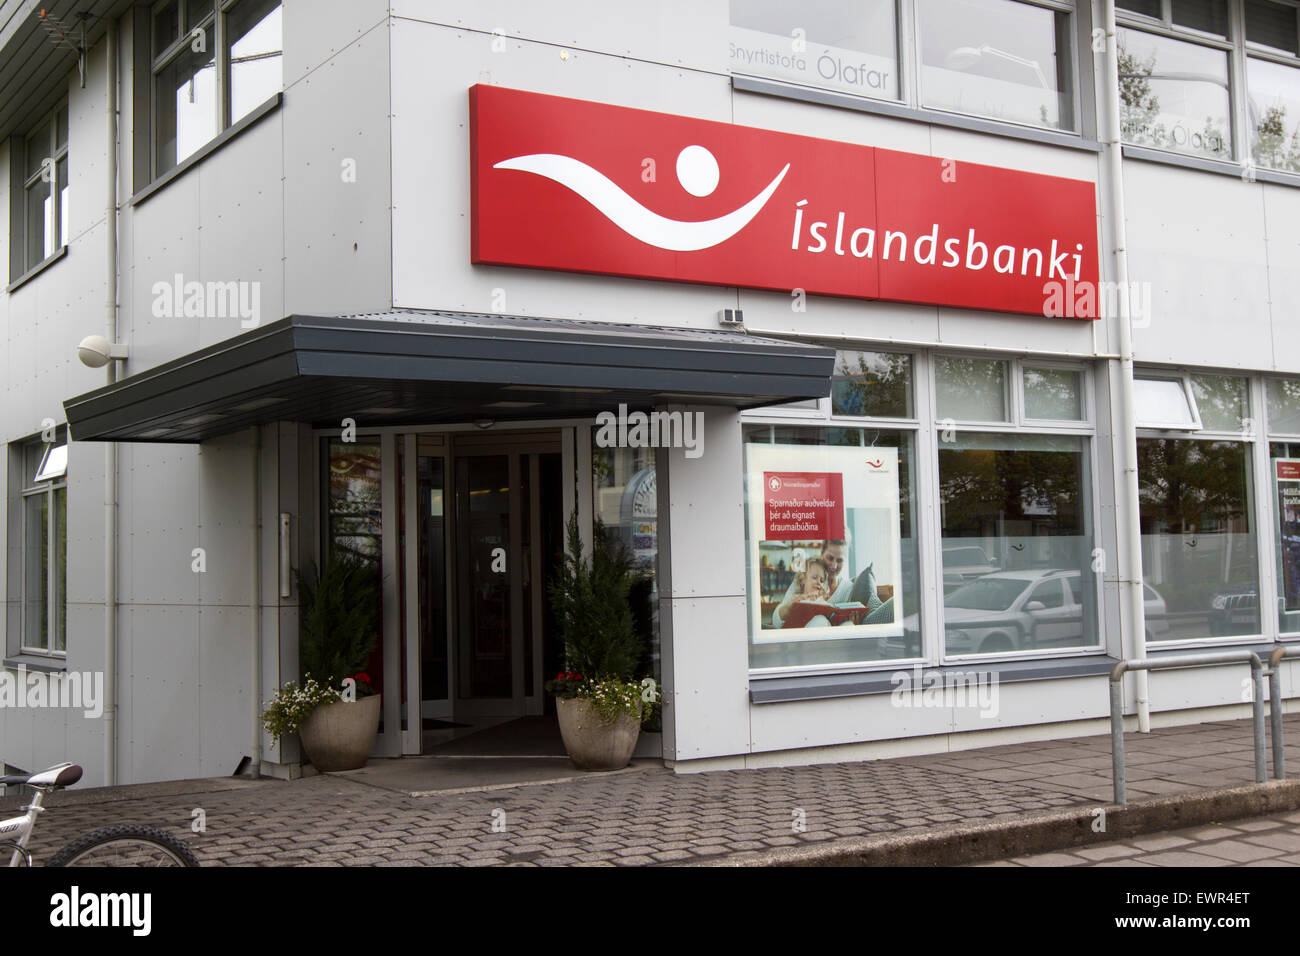 Islandsbanki Bank of Island Niederlassung Island Stockbild